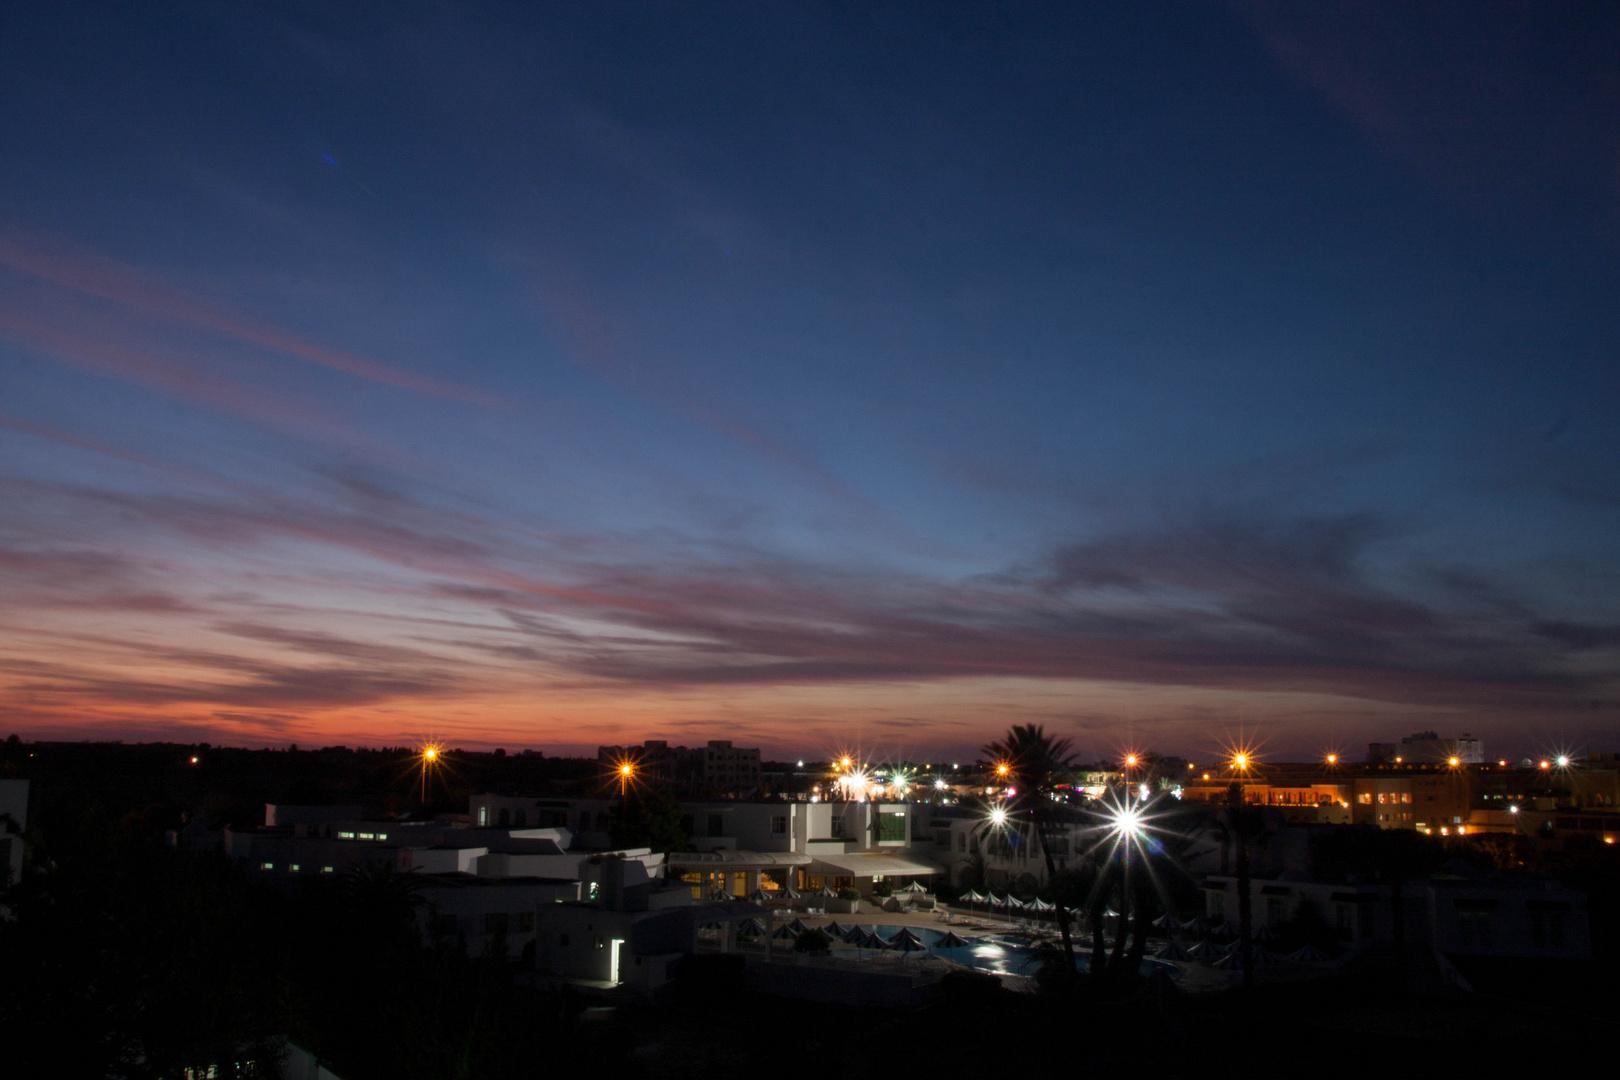 Sonnenuntergang / blaue Stunde?